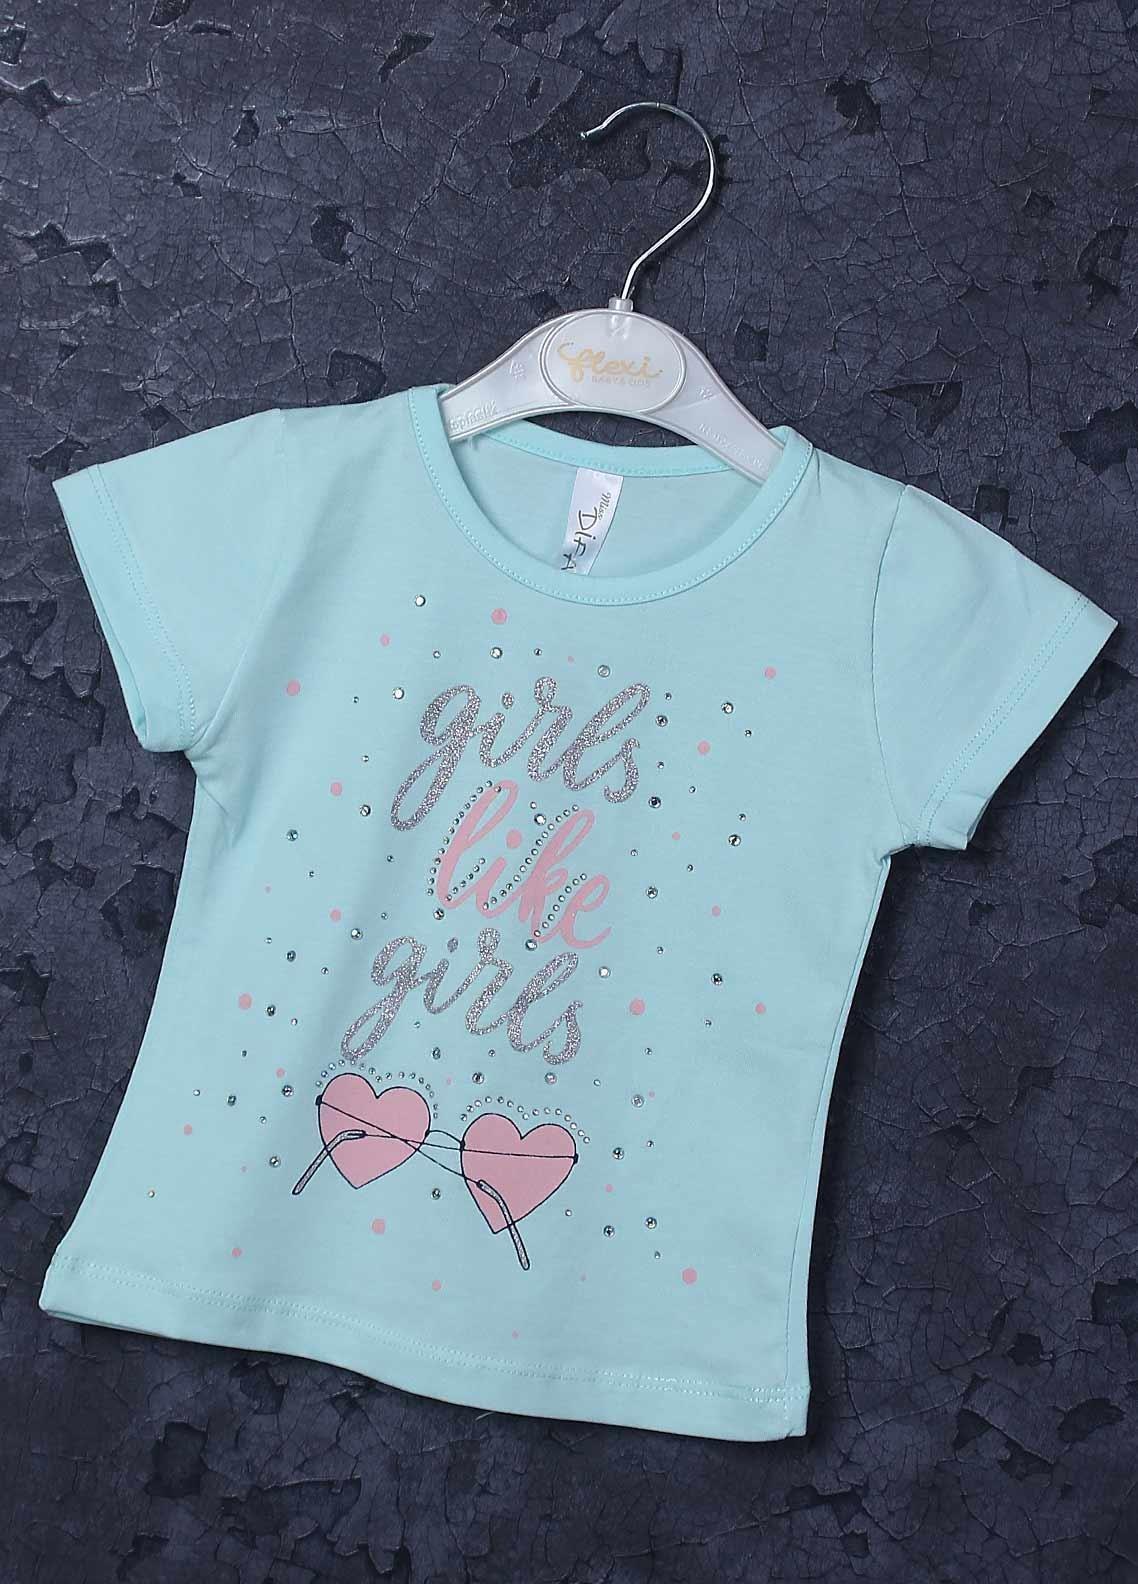 Sanaulla Exclusive Range Mix Cotton Printed Girls T-Shirts -  95731 Sky Blue